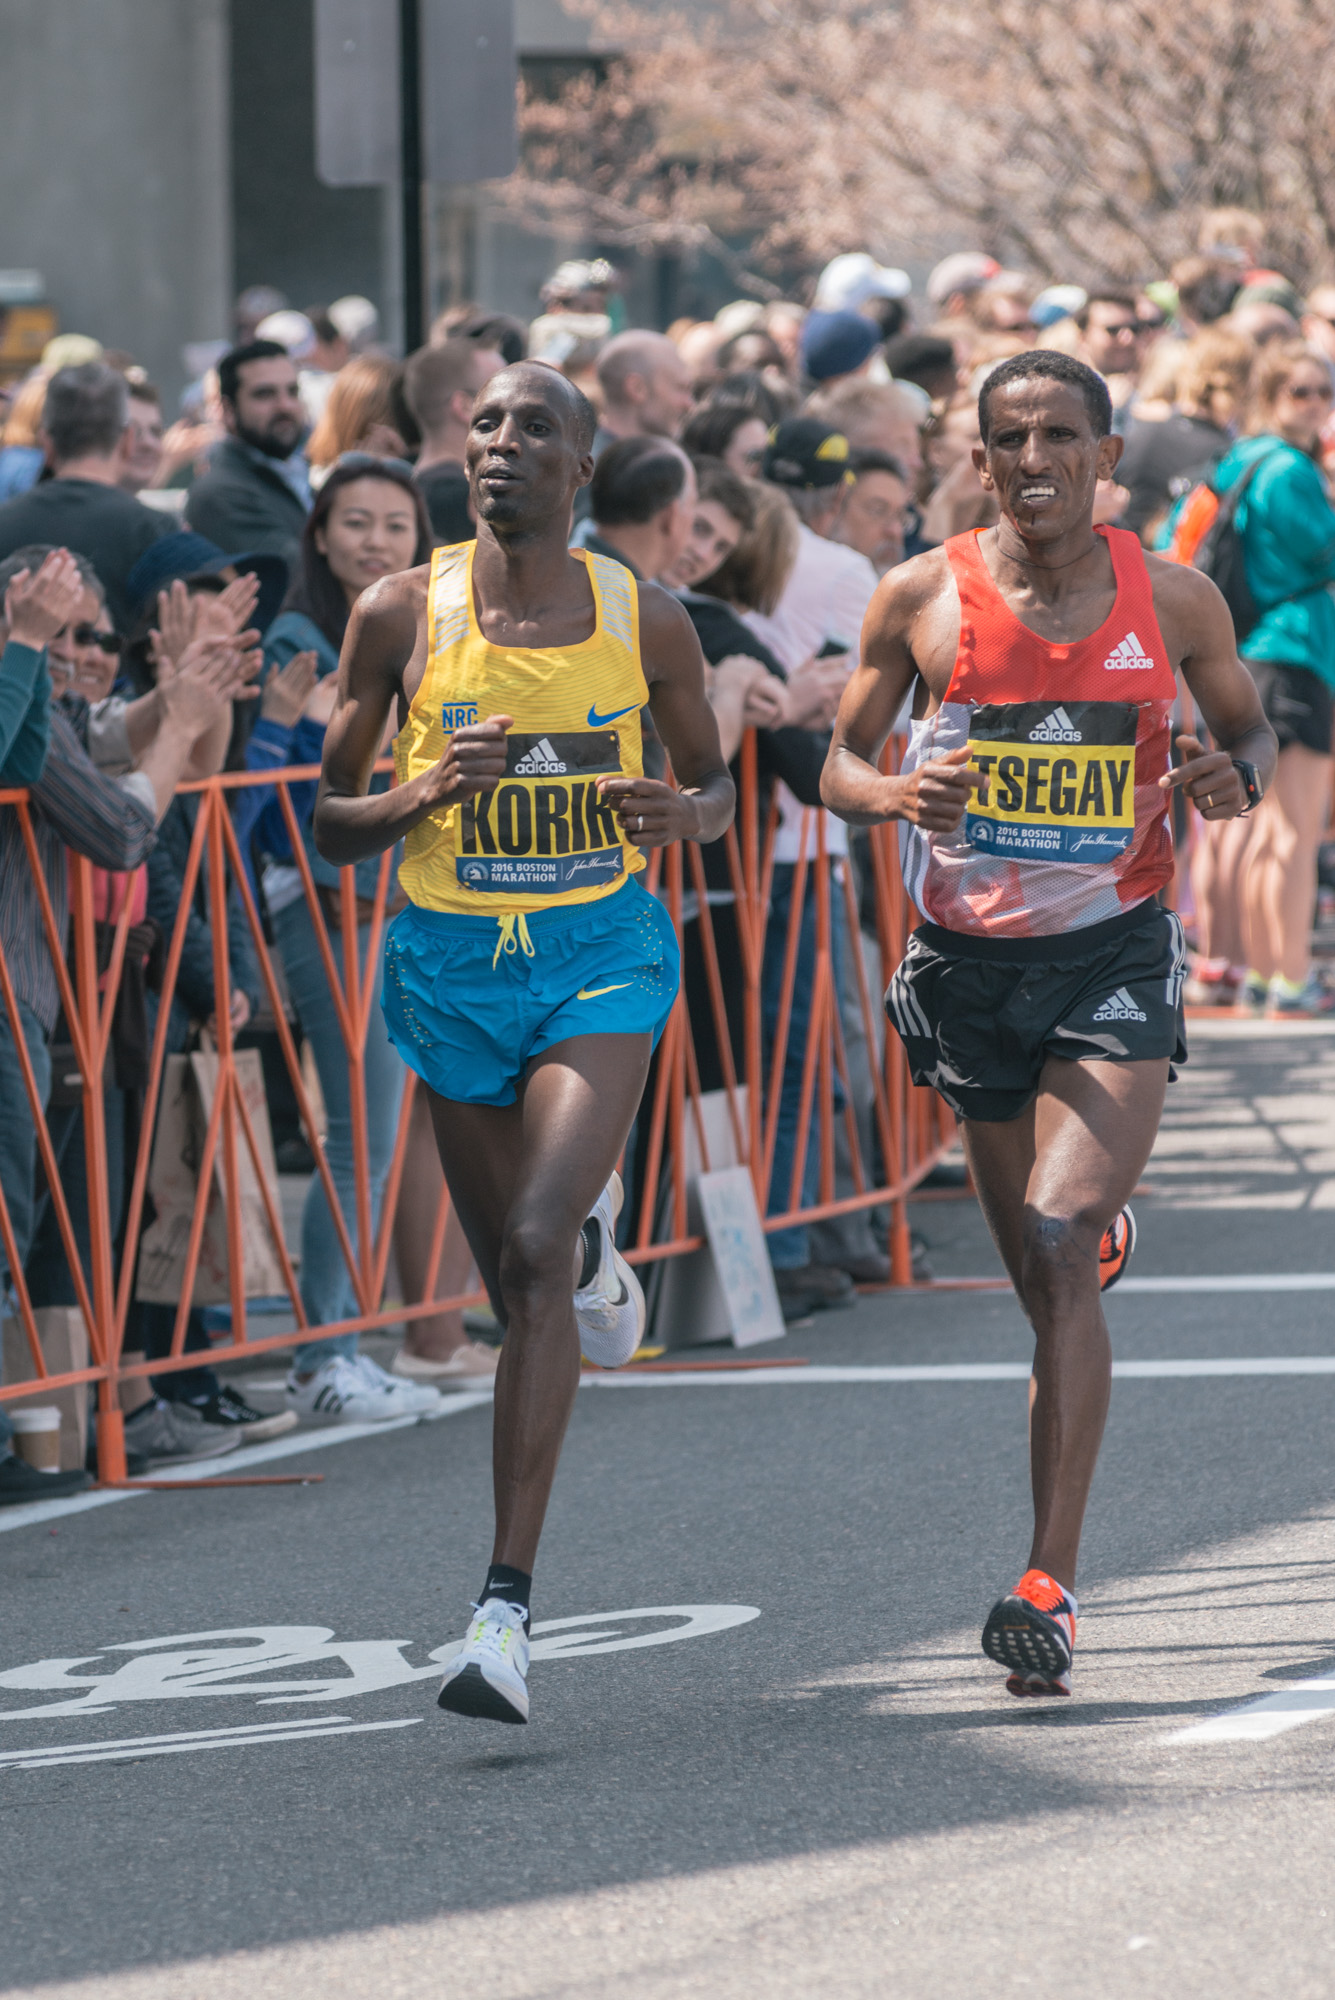 Wesley Korir - 4th place & Yemane Adhane Tseg -3rd place